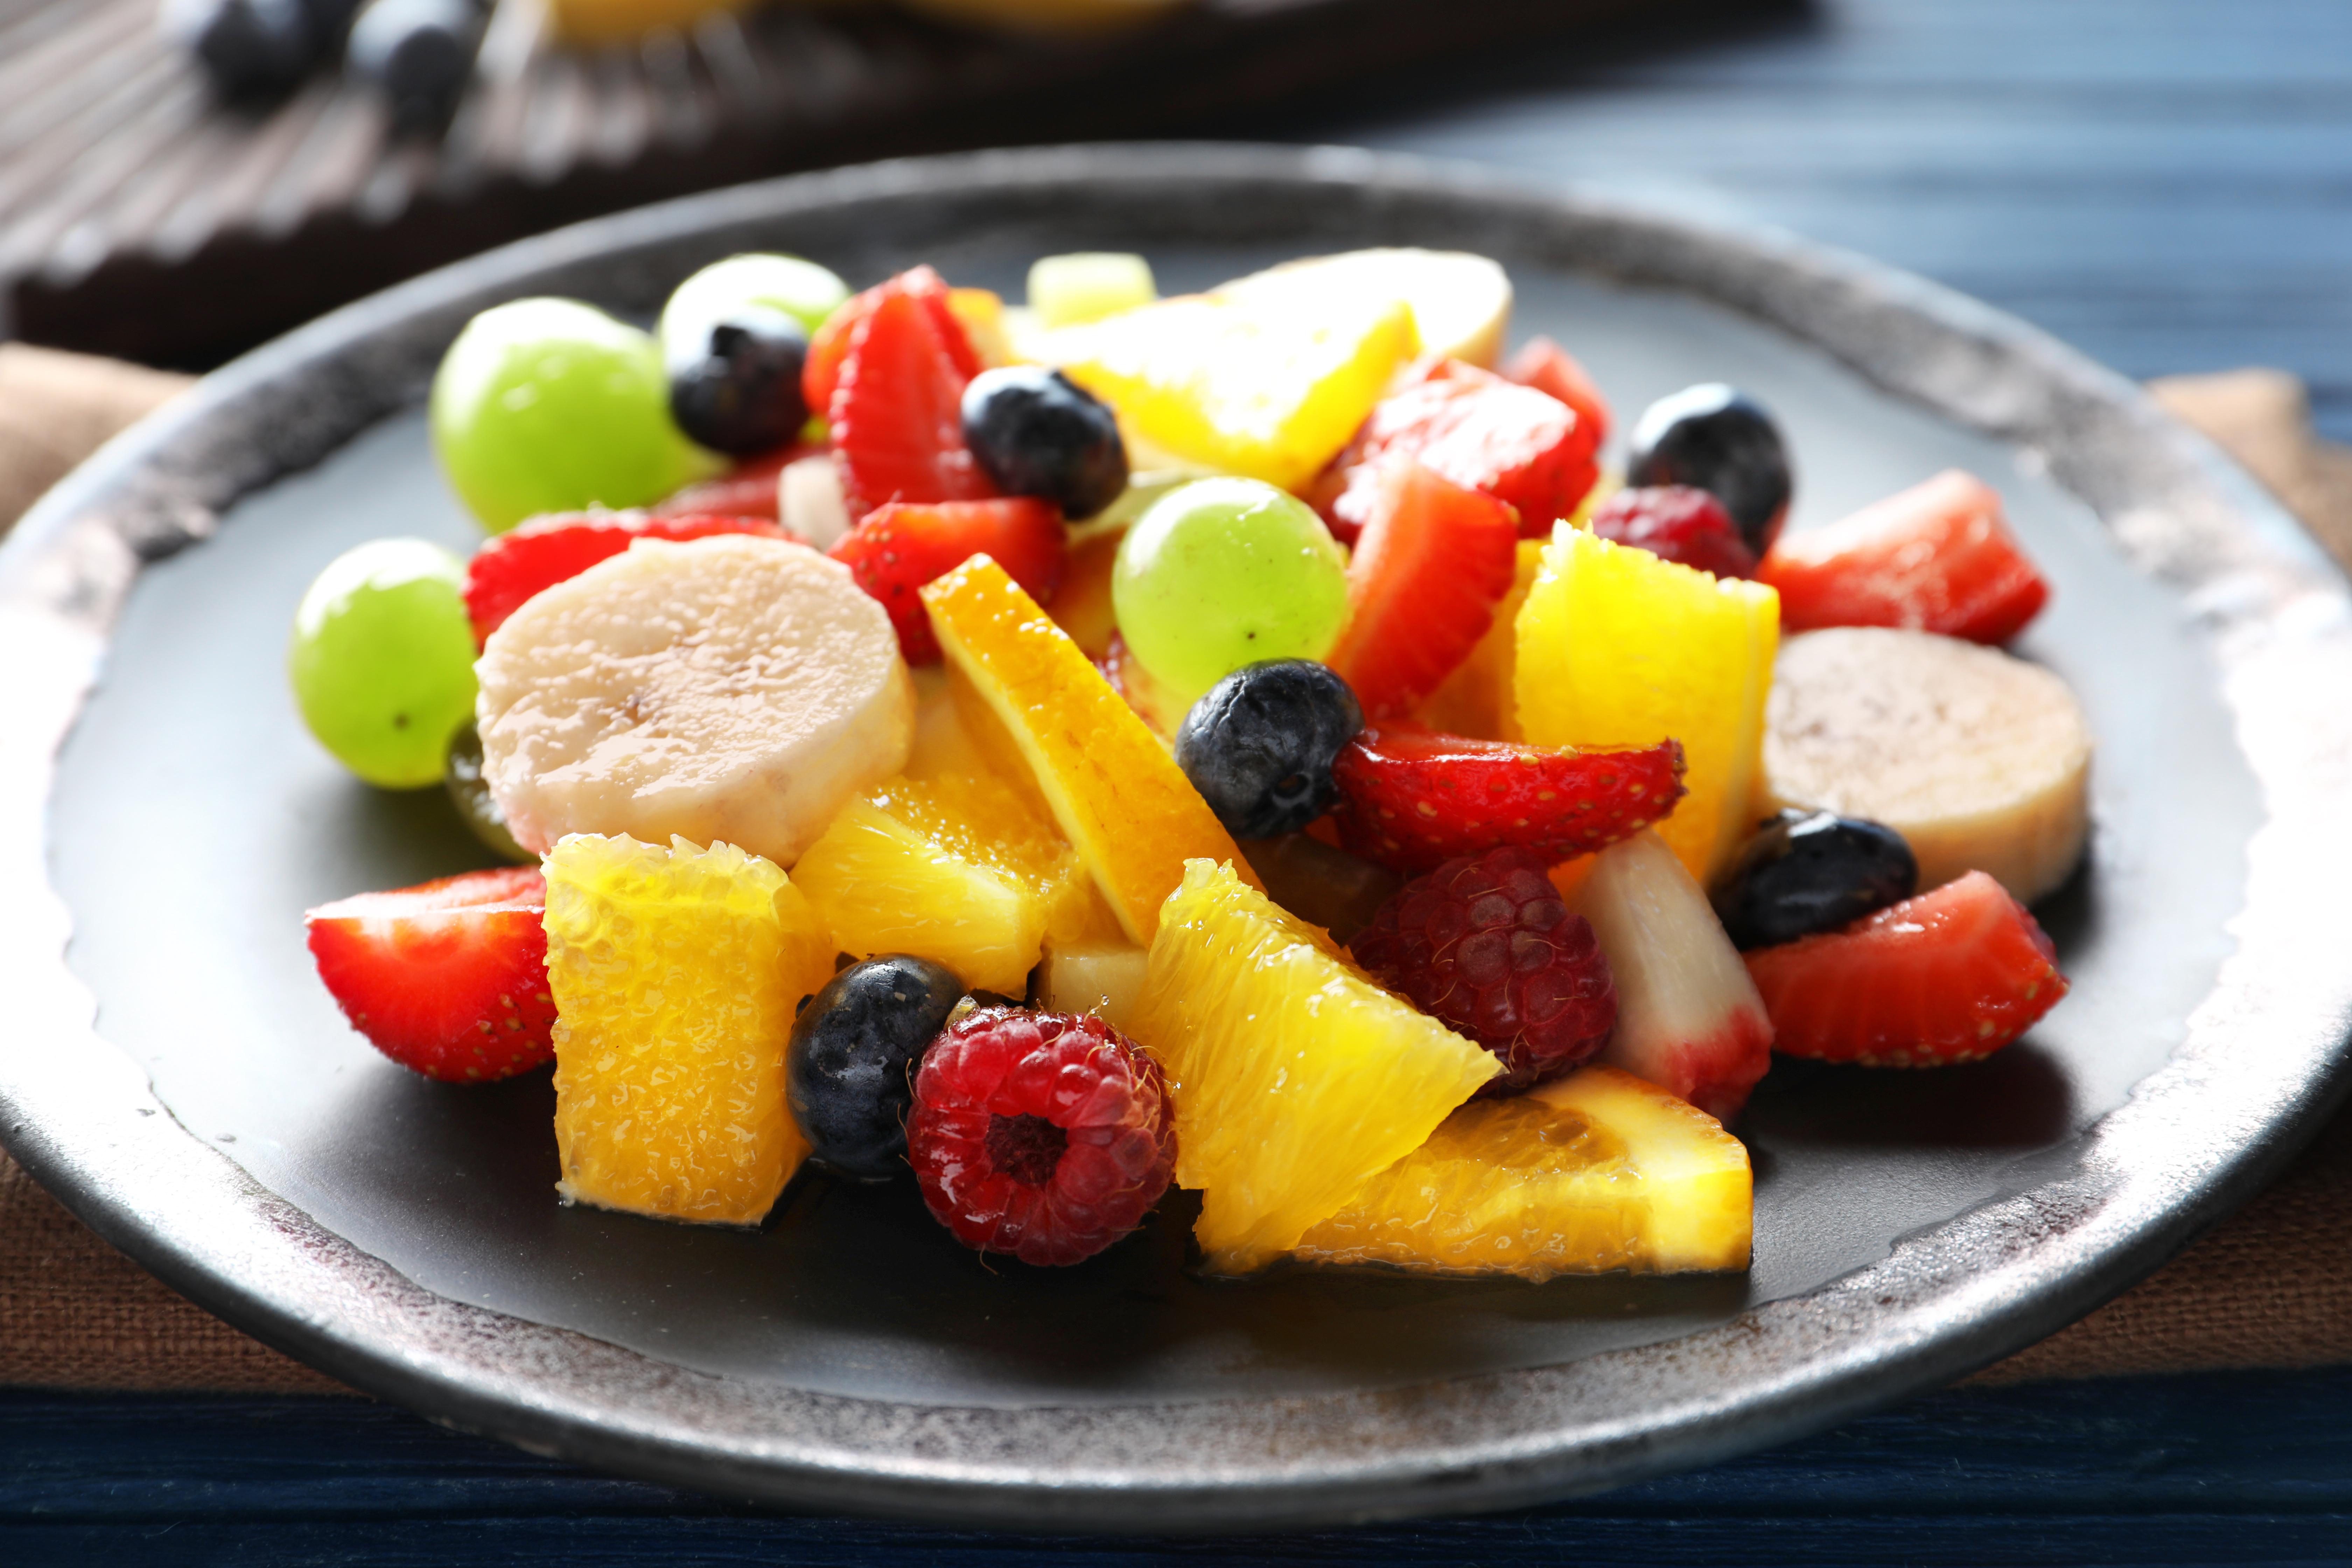 Frutas: opções saudáveis para os pets